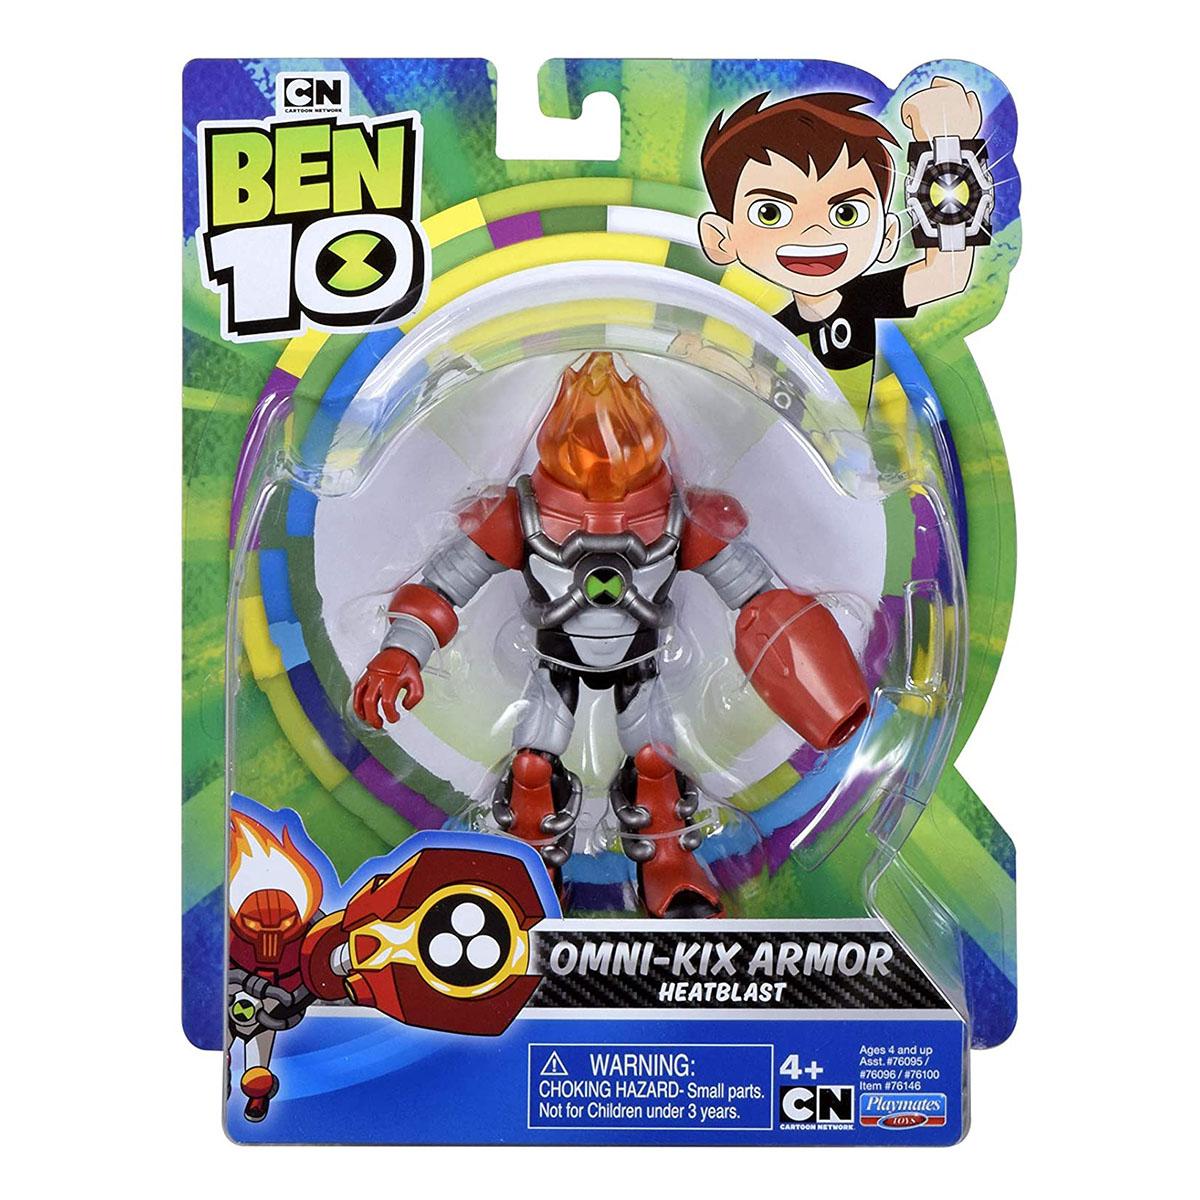 Figurina Ben 10, Omni-Kix Armor, Heatblast, 76146, 12 cm